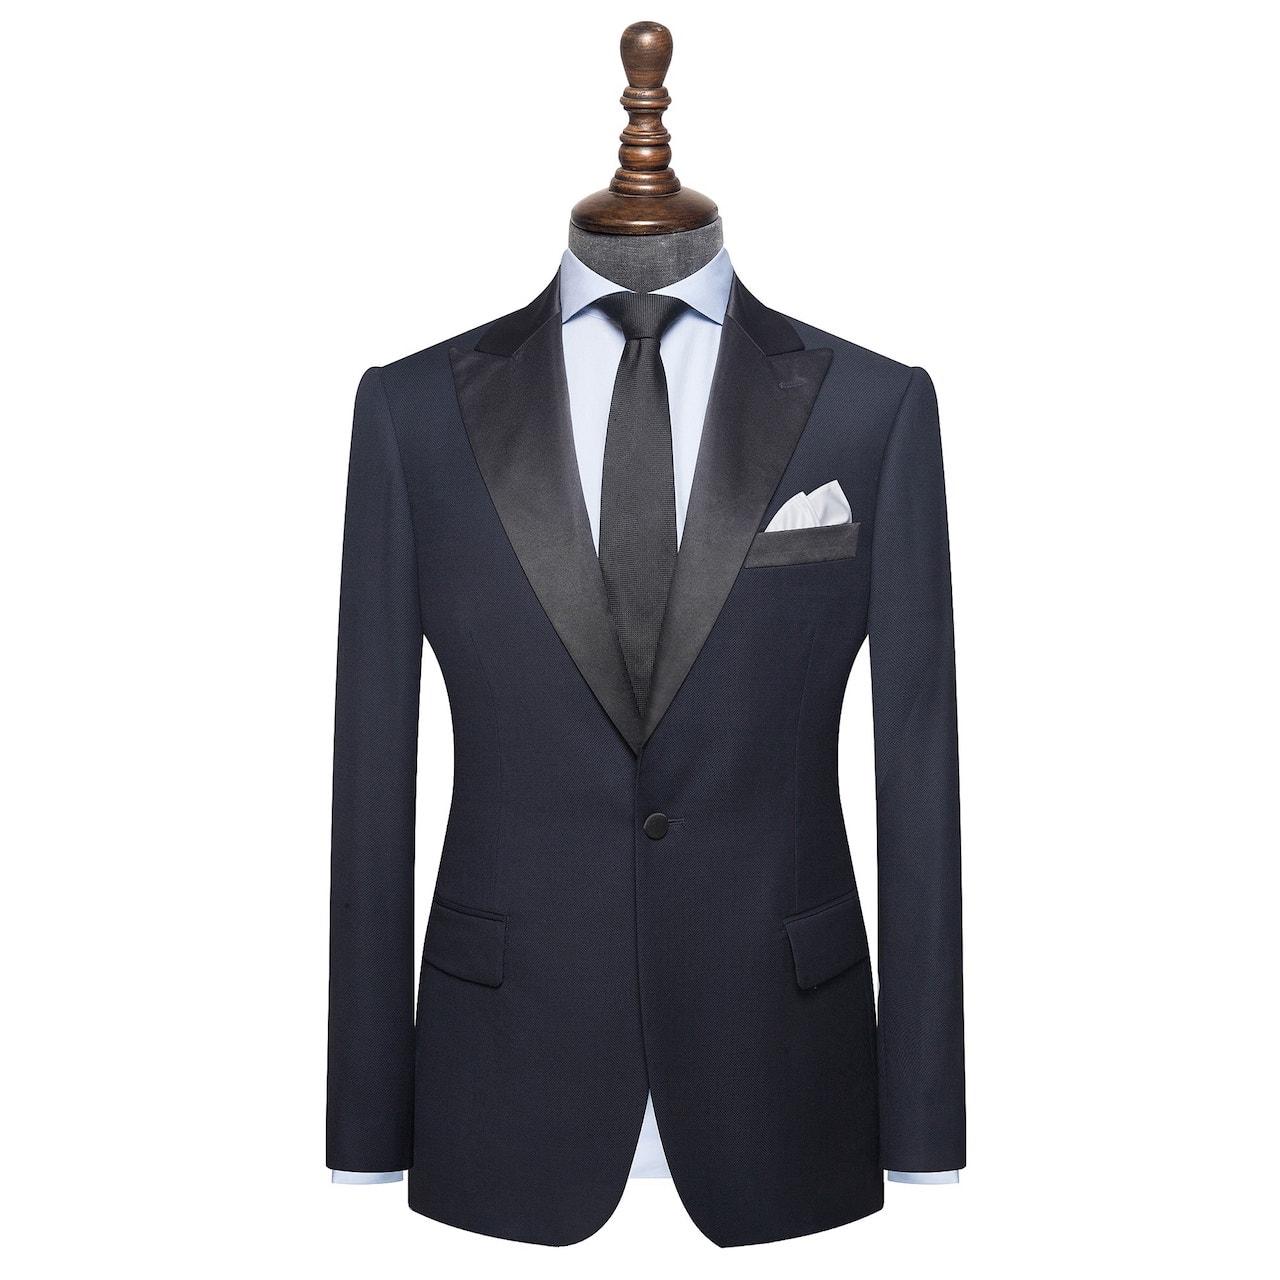 InStitchu Suit Fabric 23